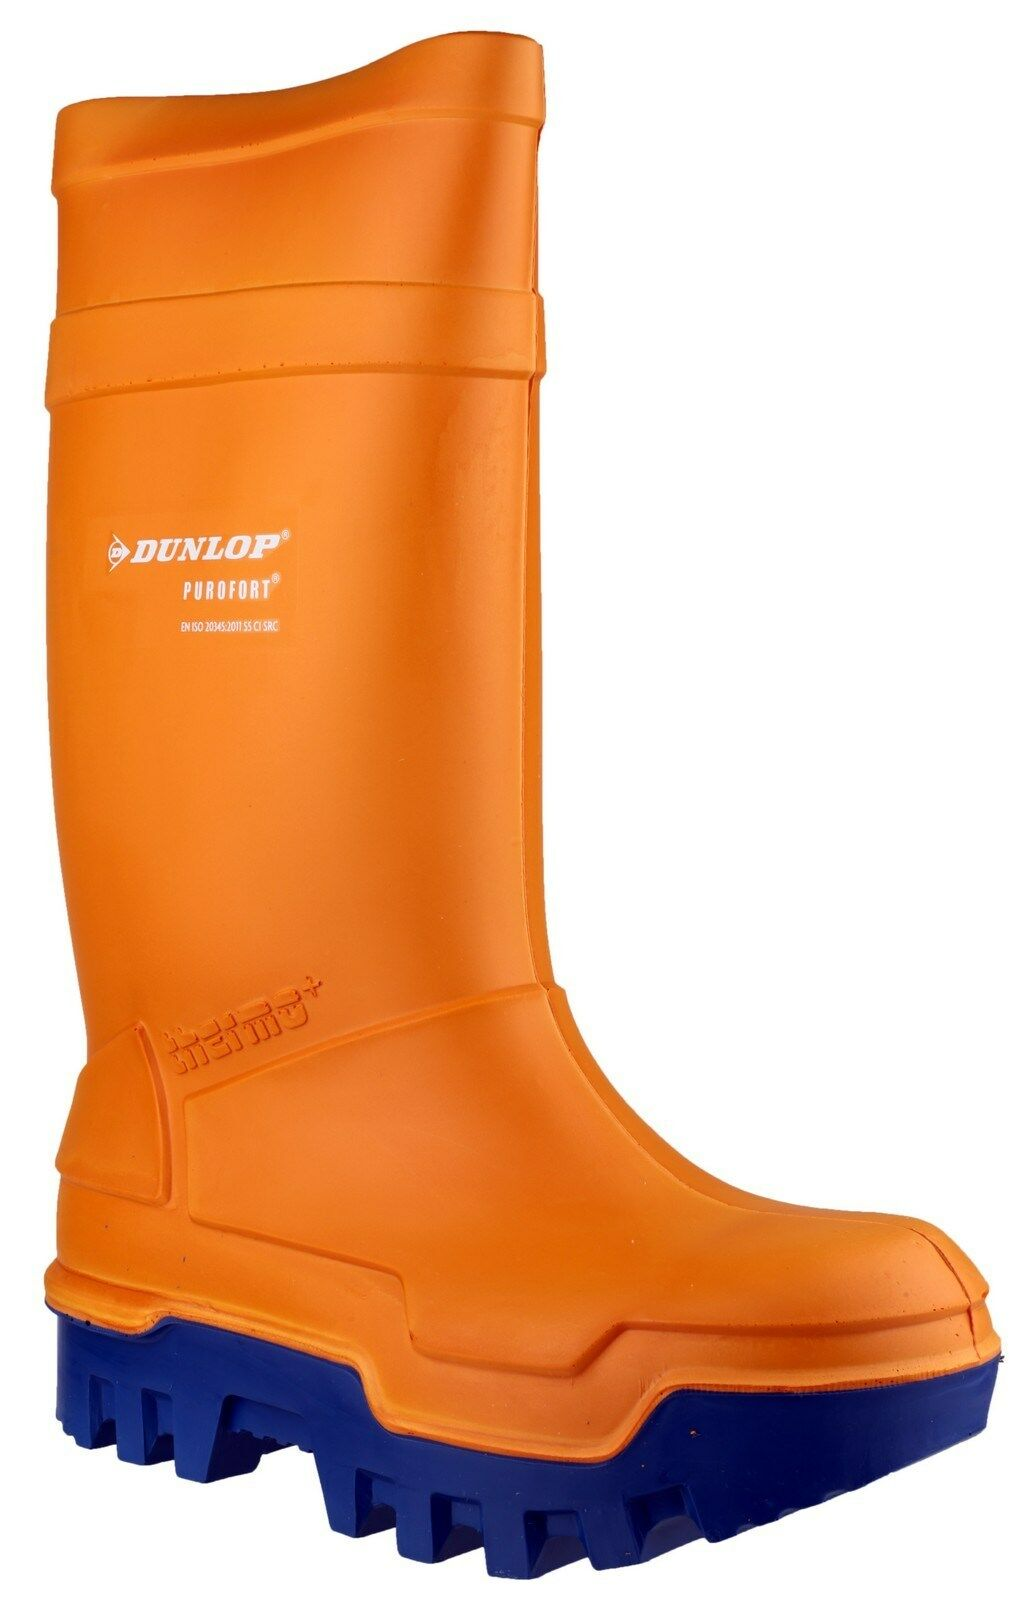 Dunlop Purofort Thermo + On sicurezza completa Arancione Pull On + Stivali in UK4-13 003ee5